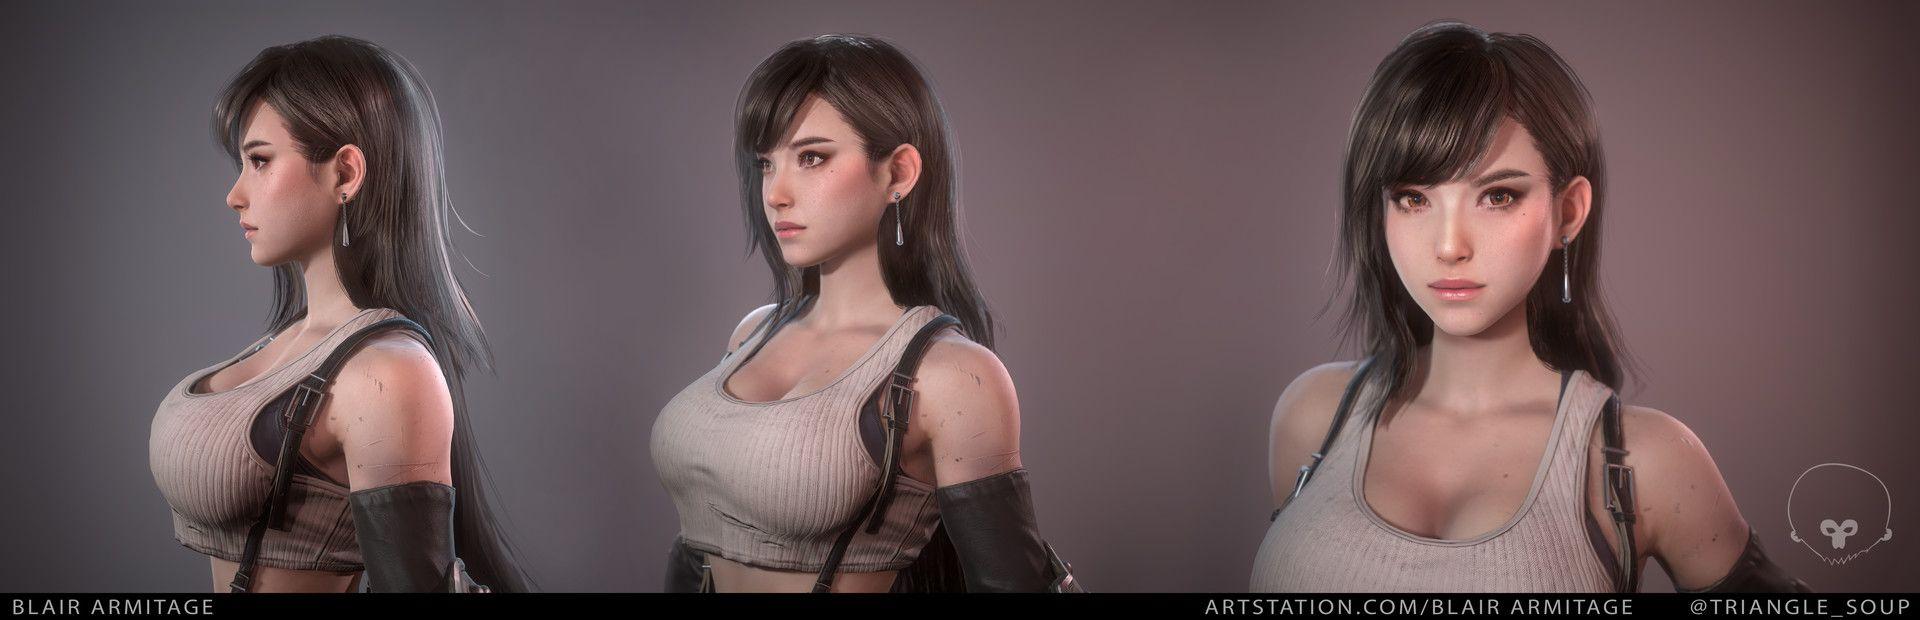 Тифа Локхарт - Final Fantasy 7 персонаж, рендер